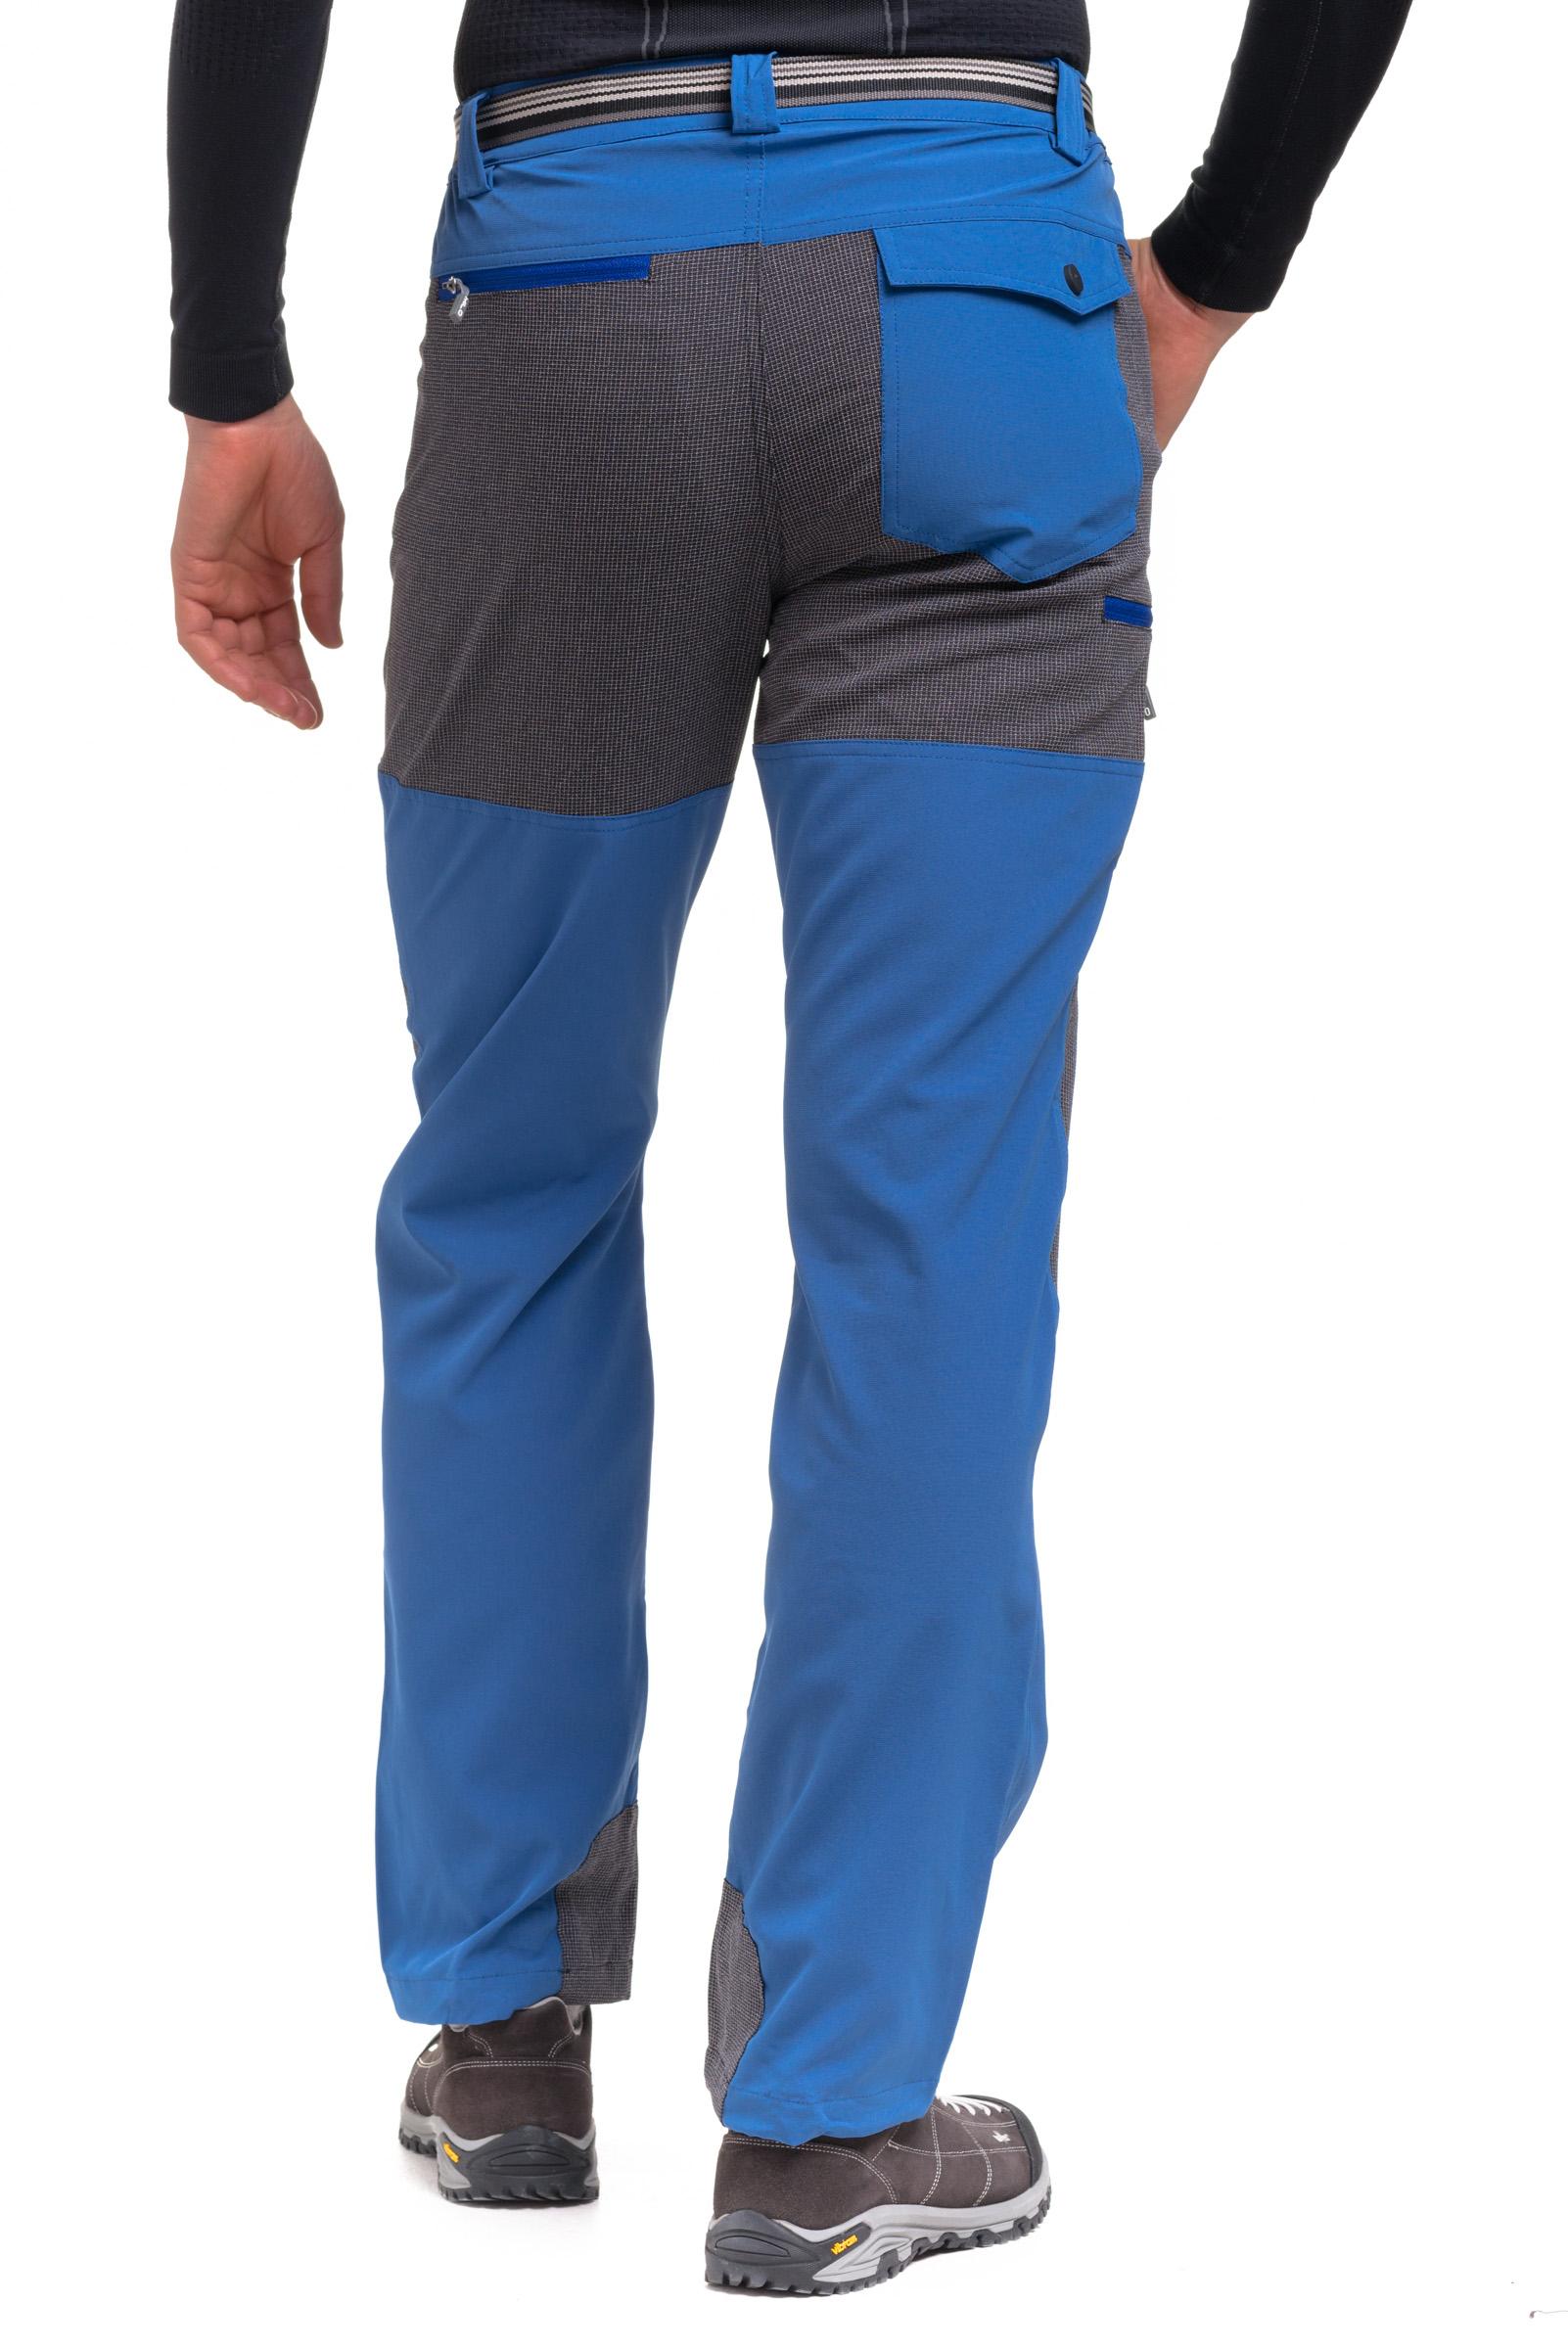 spodnie milo gabro ranking